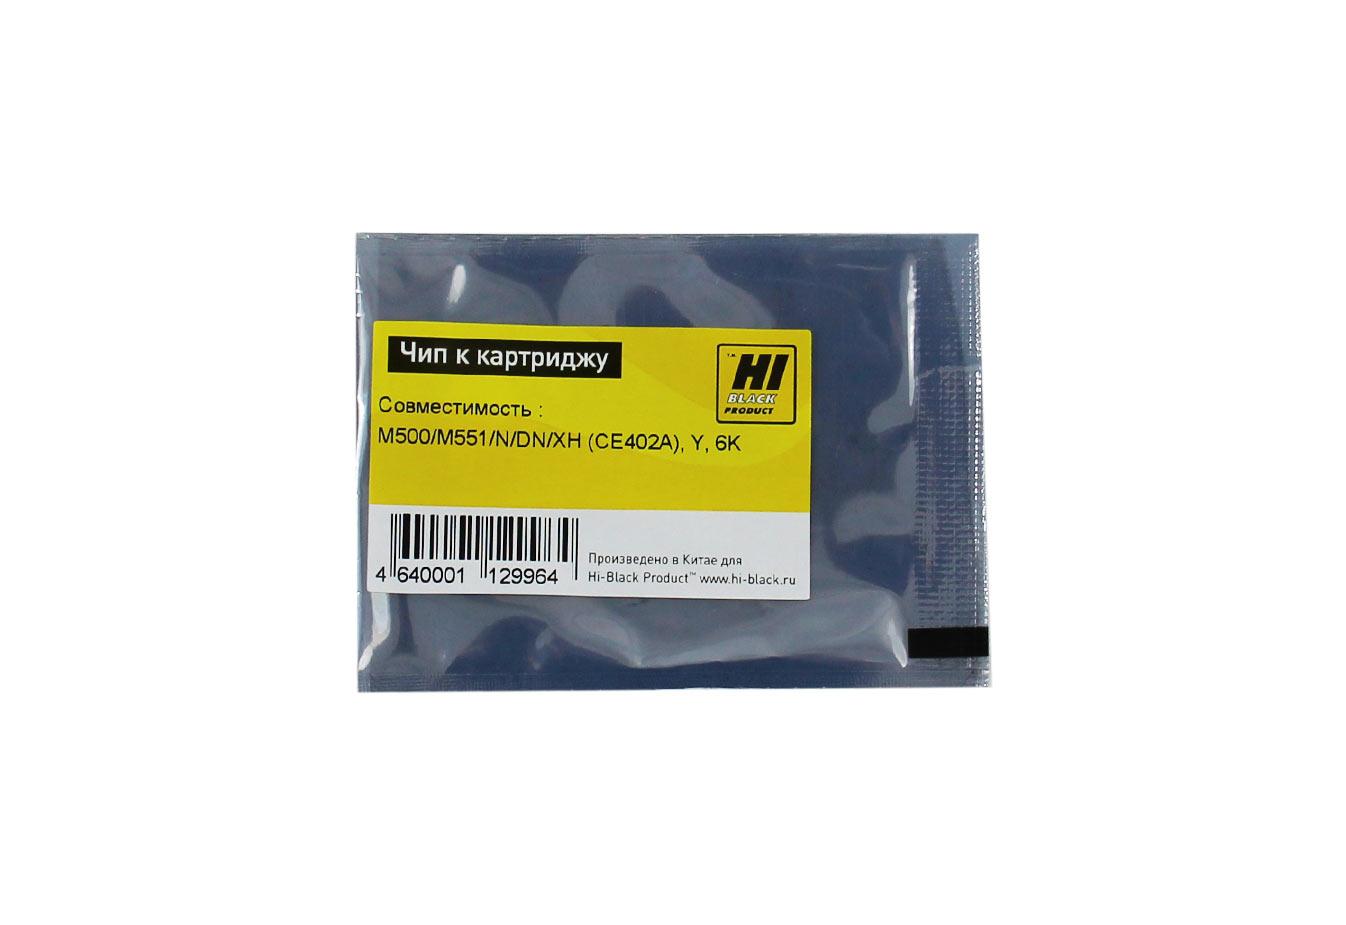 Чип Hi-Black к картриджу HP CLJ Enterprise M500/M551/N/DN/XH (CE400A), Bk, 5,5K